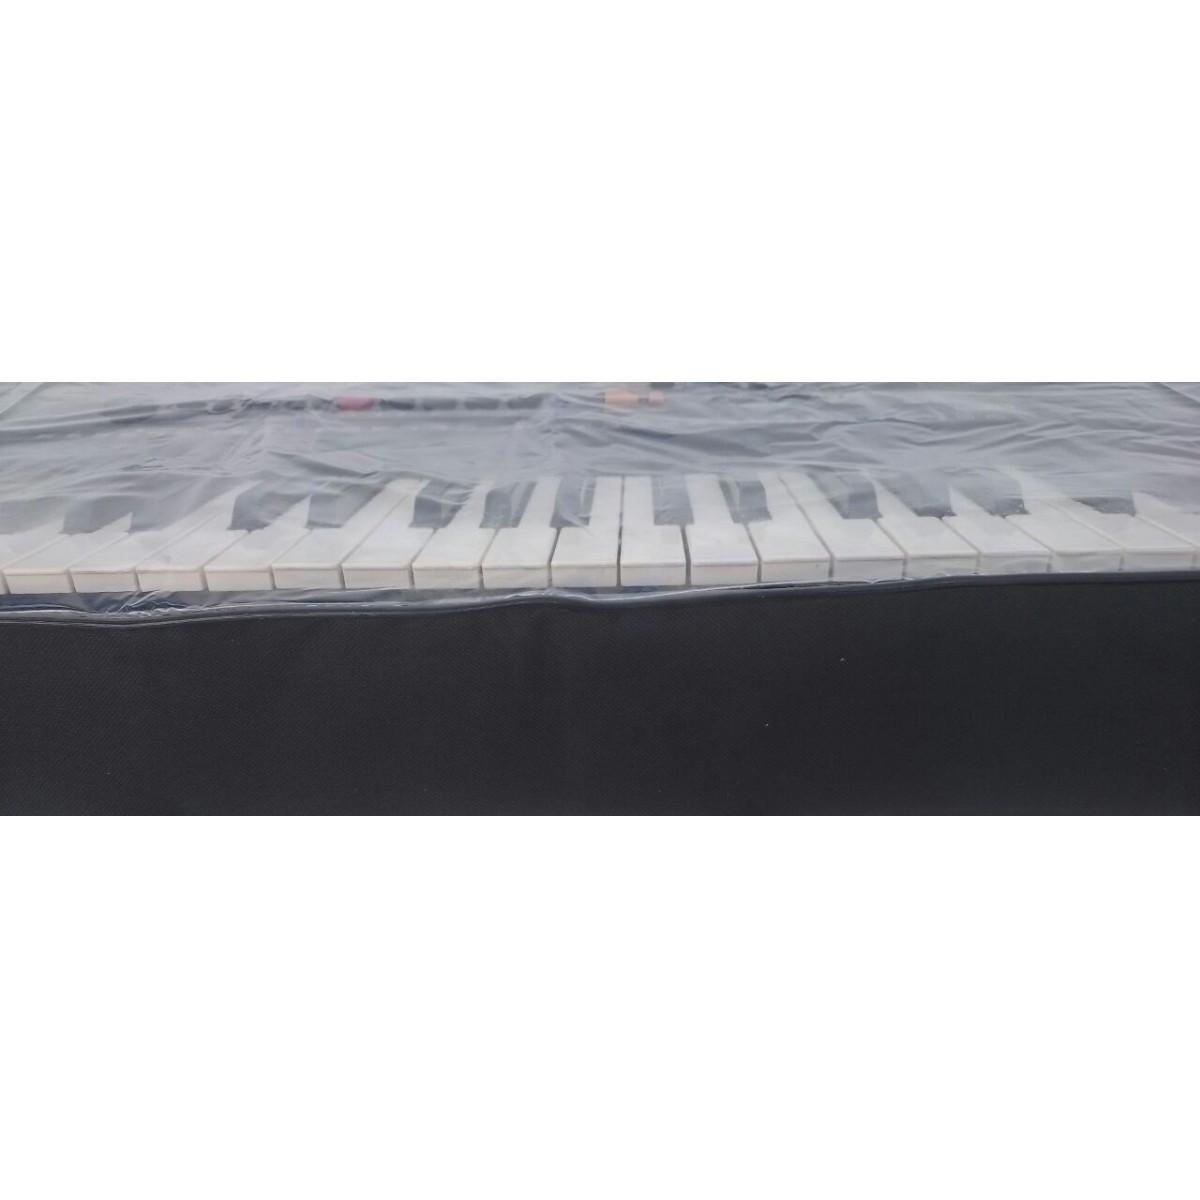 Capa expositora de Teclados 5/8 Yamaha PSR S670, S910 MOTIF XS6, Roland e Outros (100 x 40 x 15 cm) CM 801